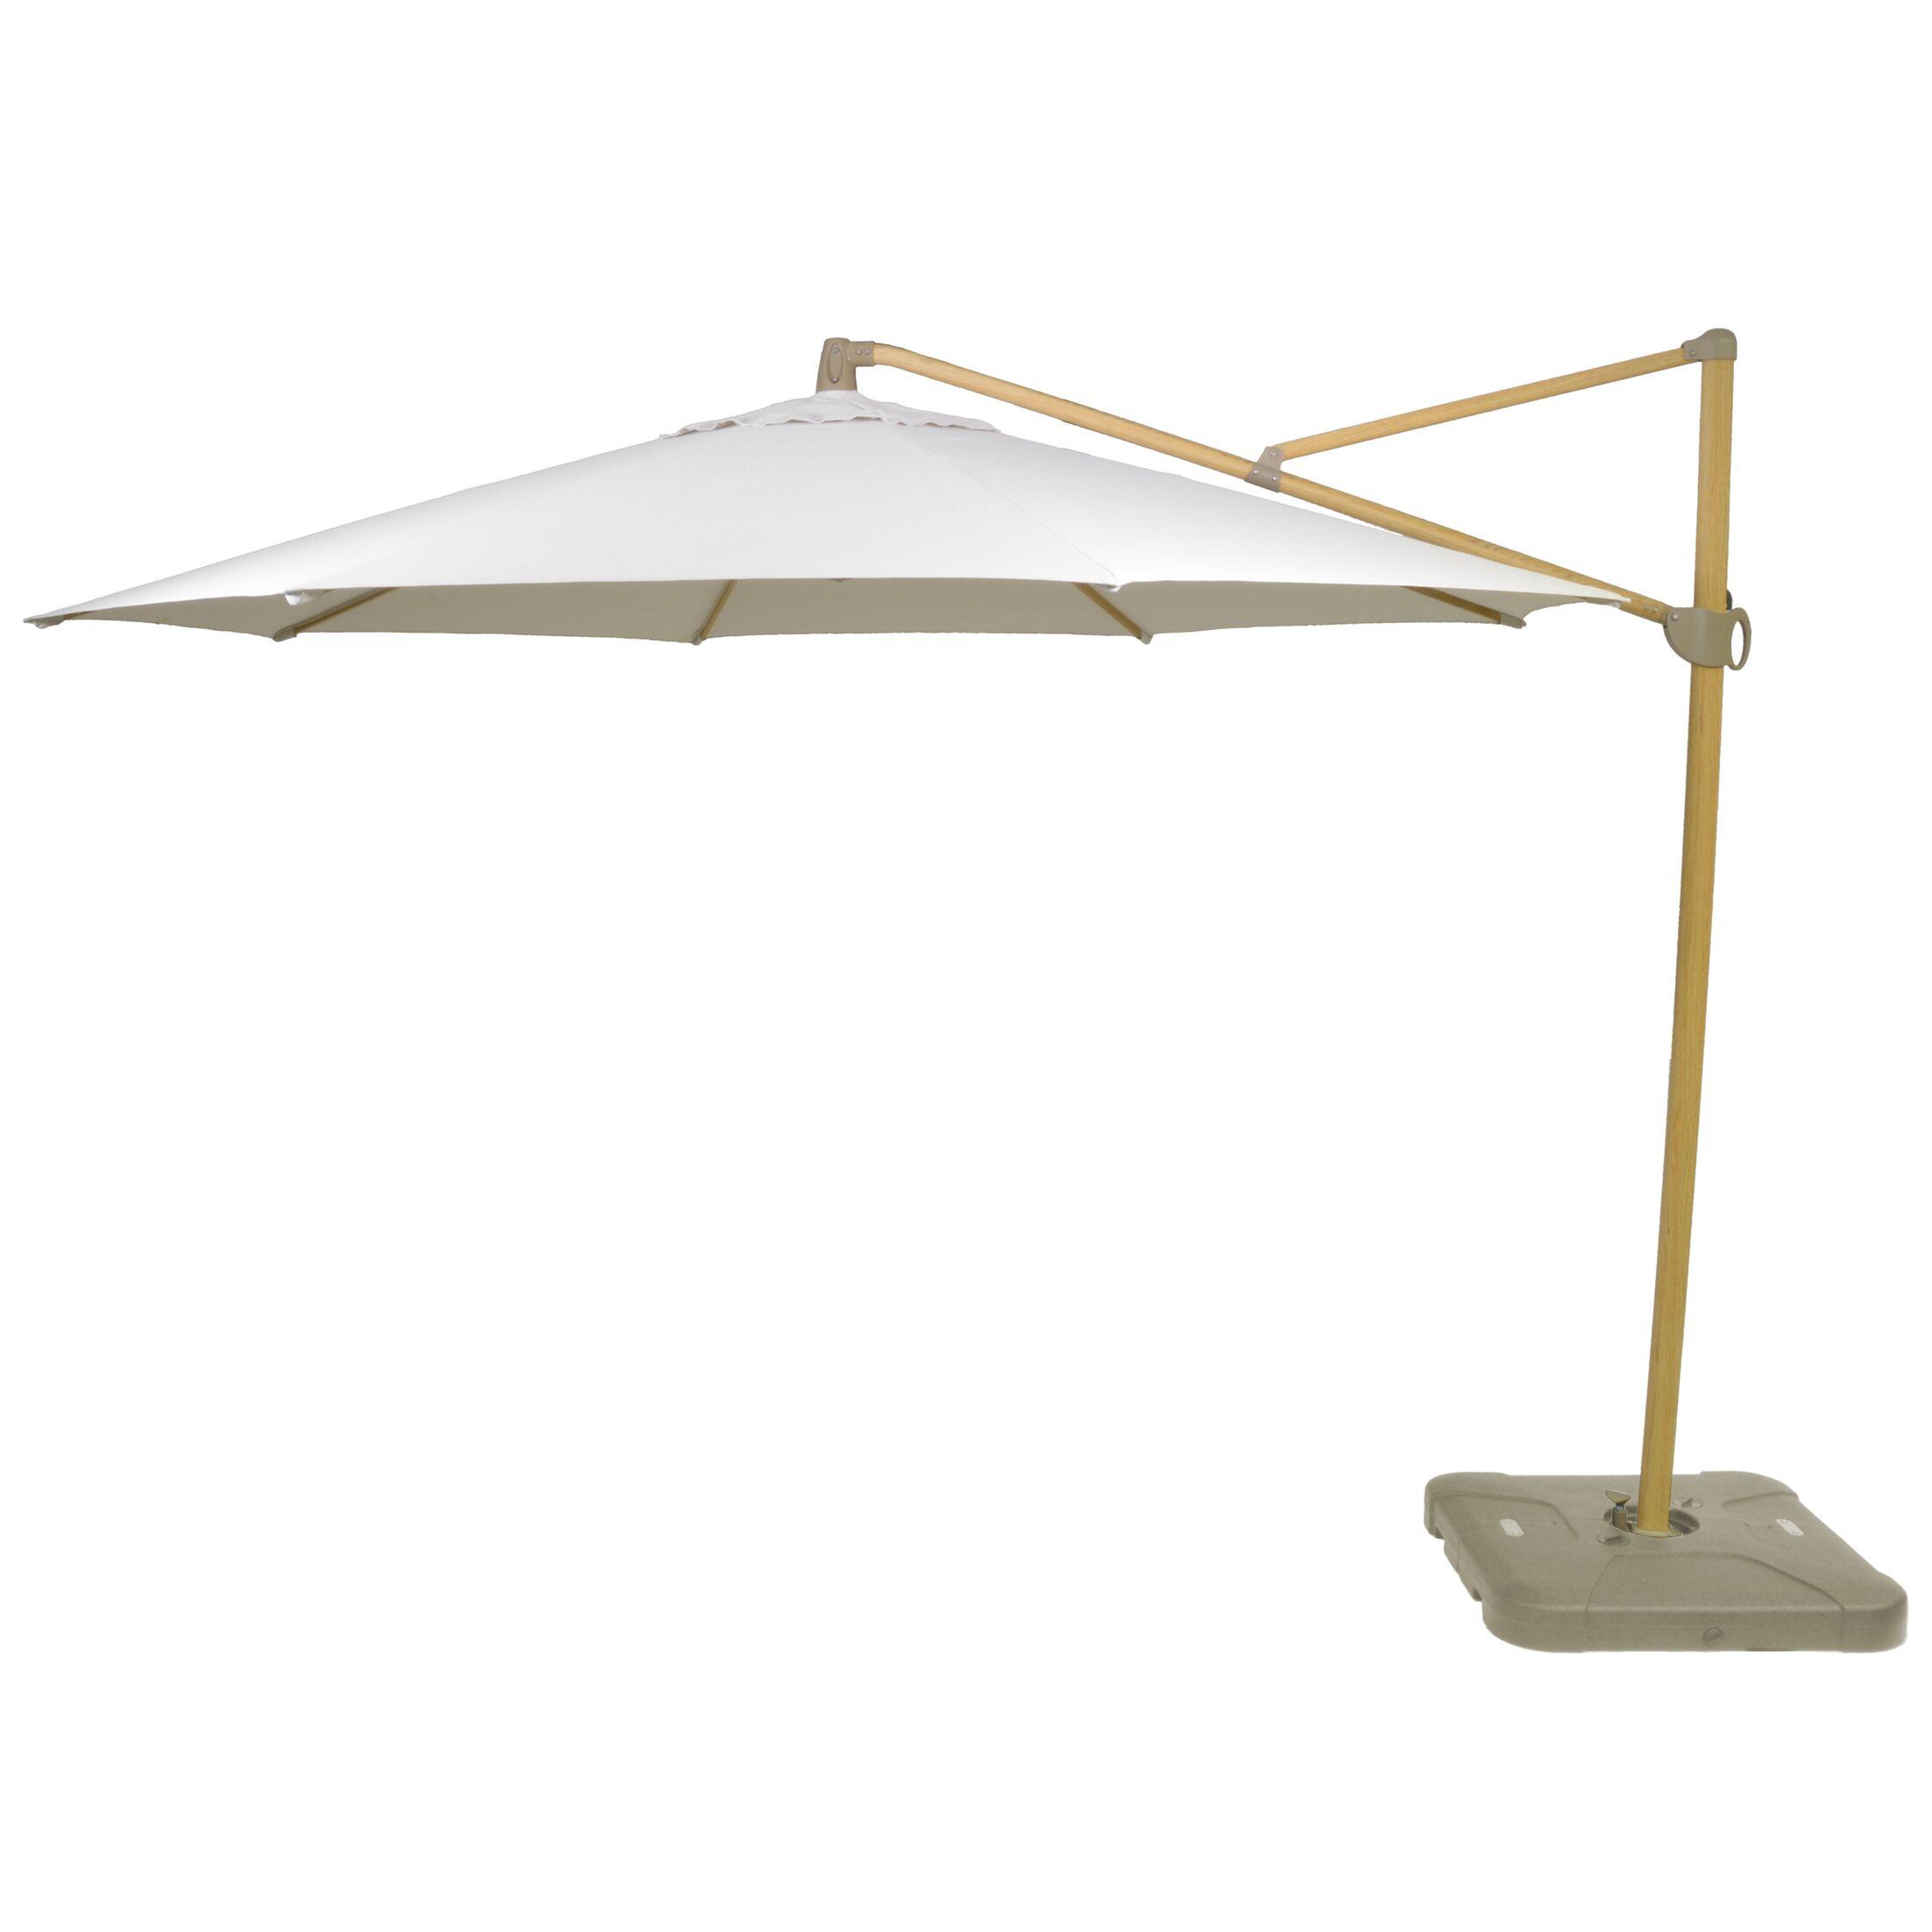 Kedzie Outdoor 11' Cantilever Umbrella Base Color: Gold, Fabric Color: Linen